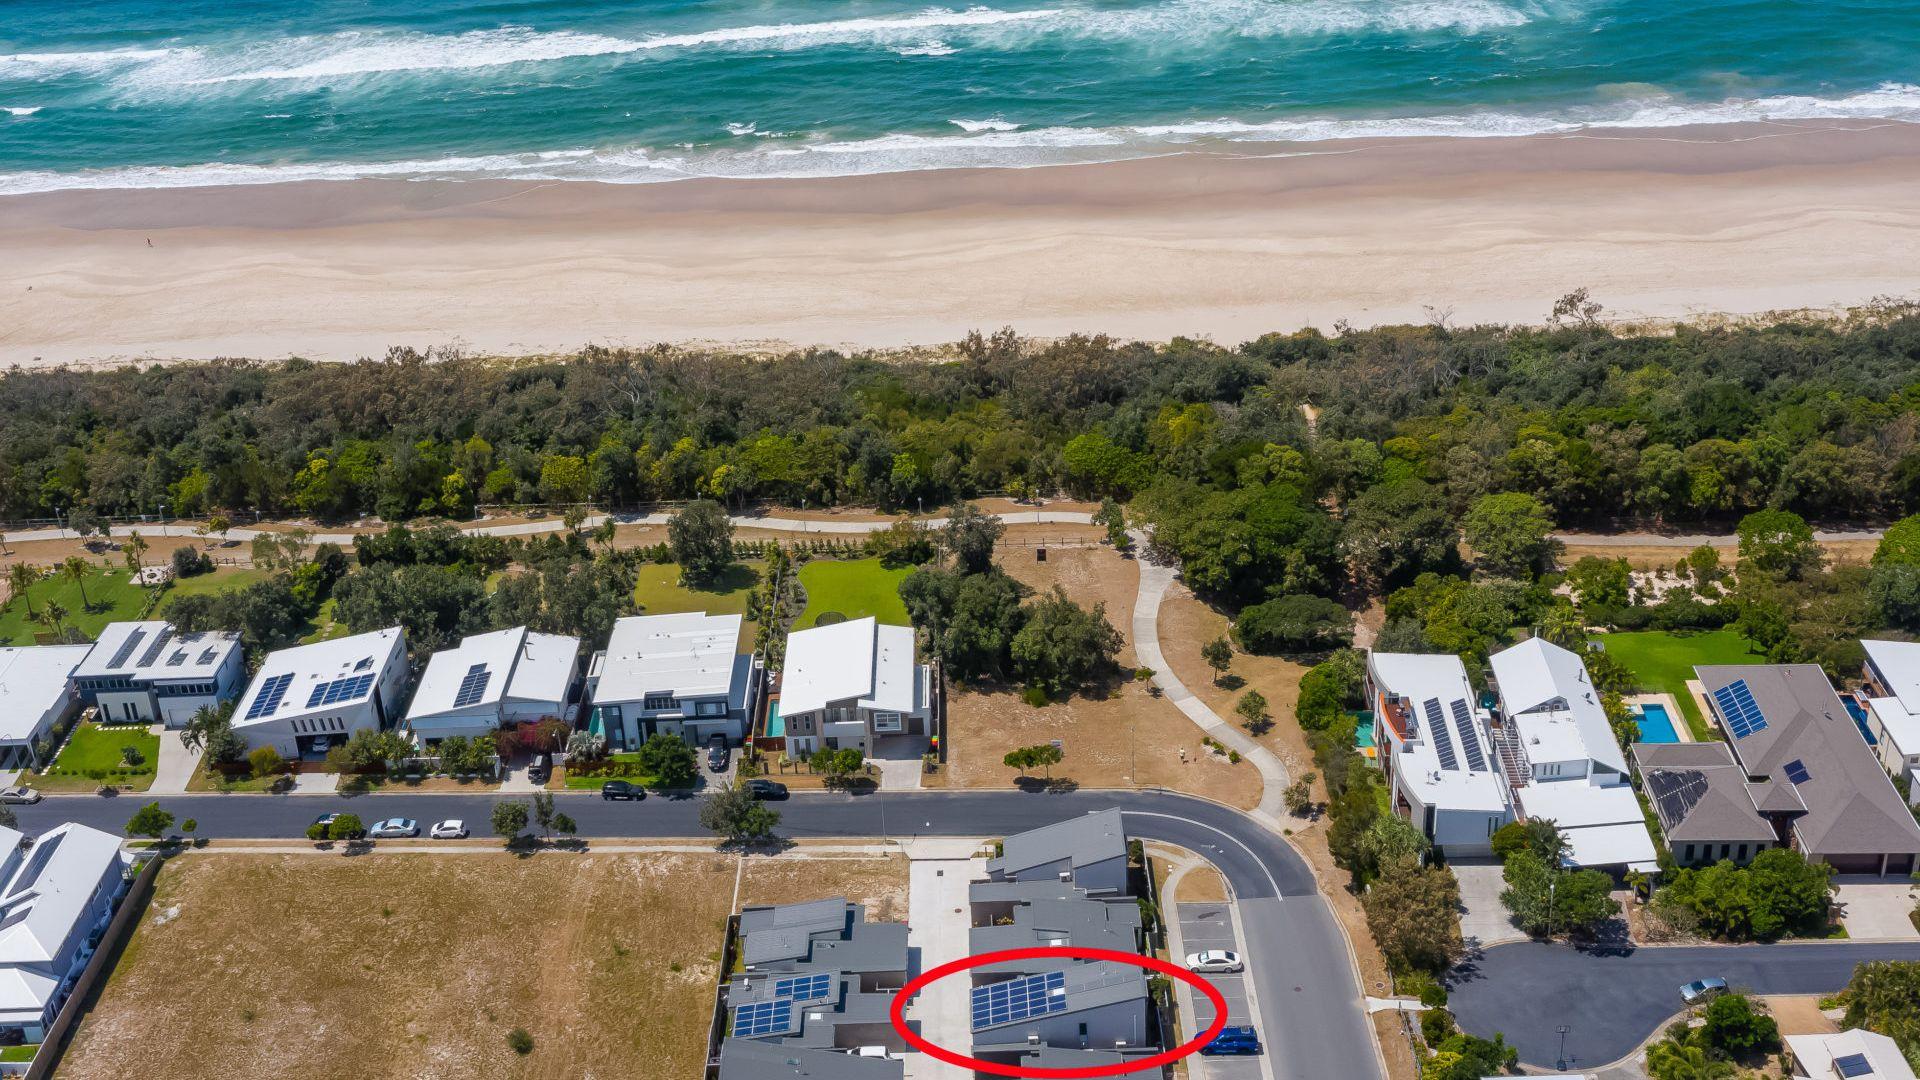 8 Sunfish Lane Beach House